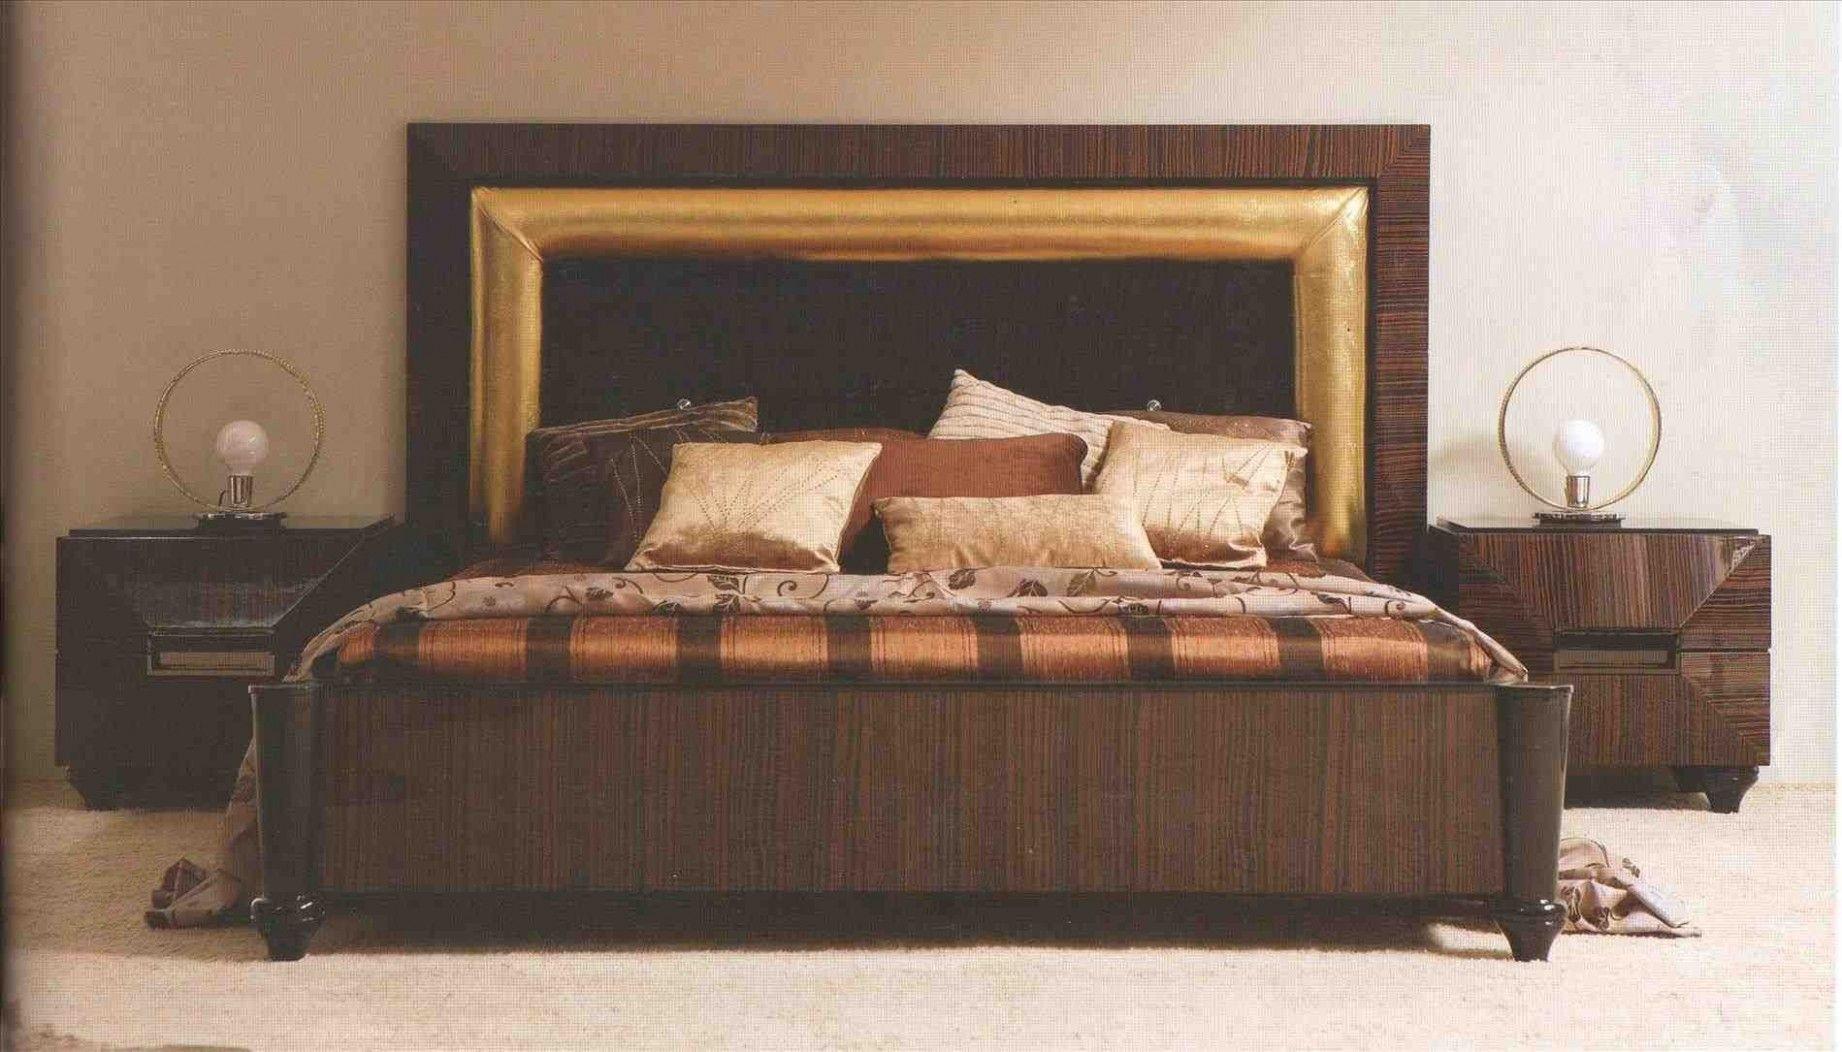 Bedroom Sofa Set Price In Pakistan